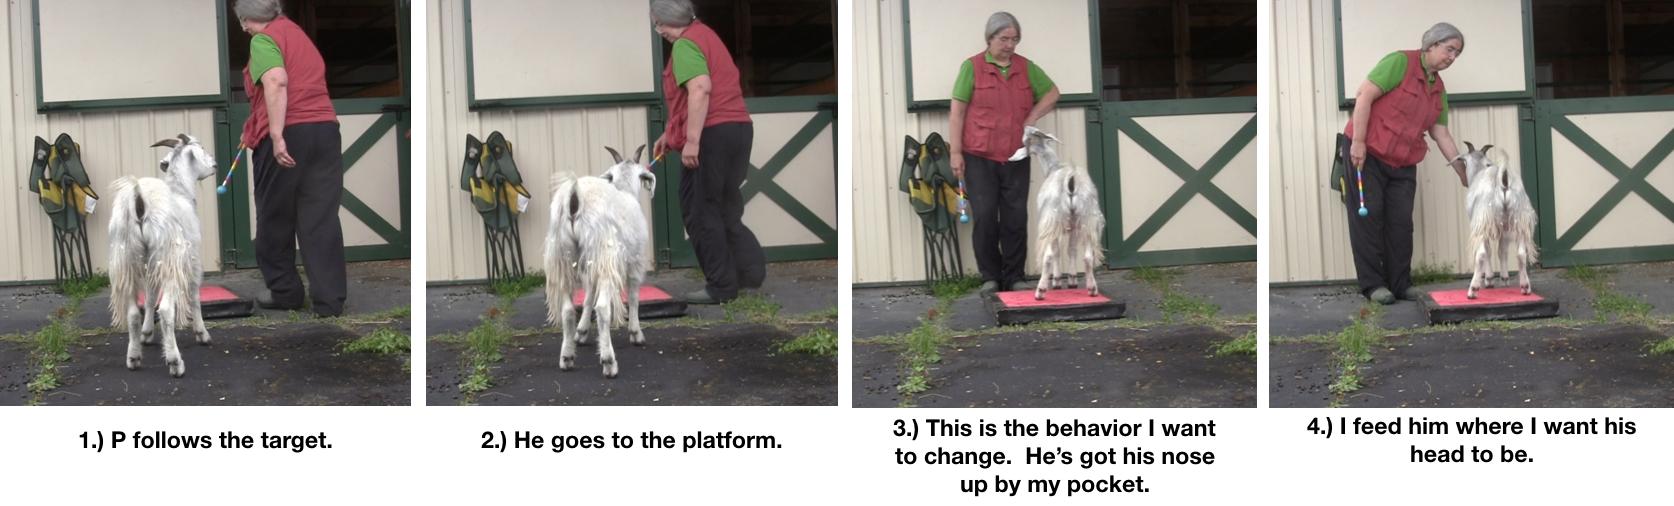 Goat Diaries Day 4 - P - Platforms Pt 1 - panels 1-4.png